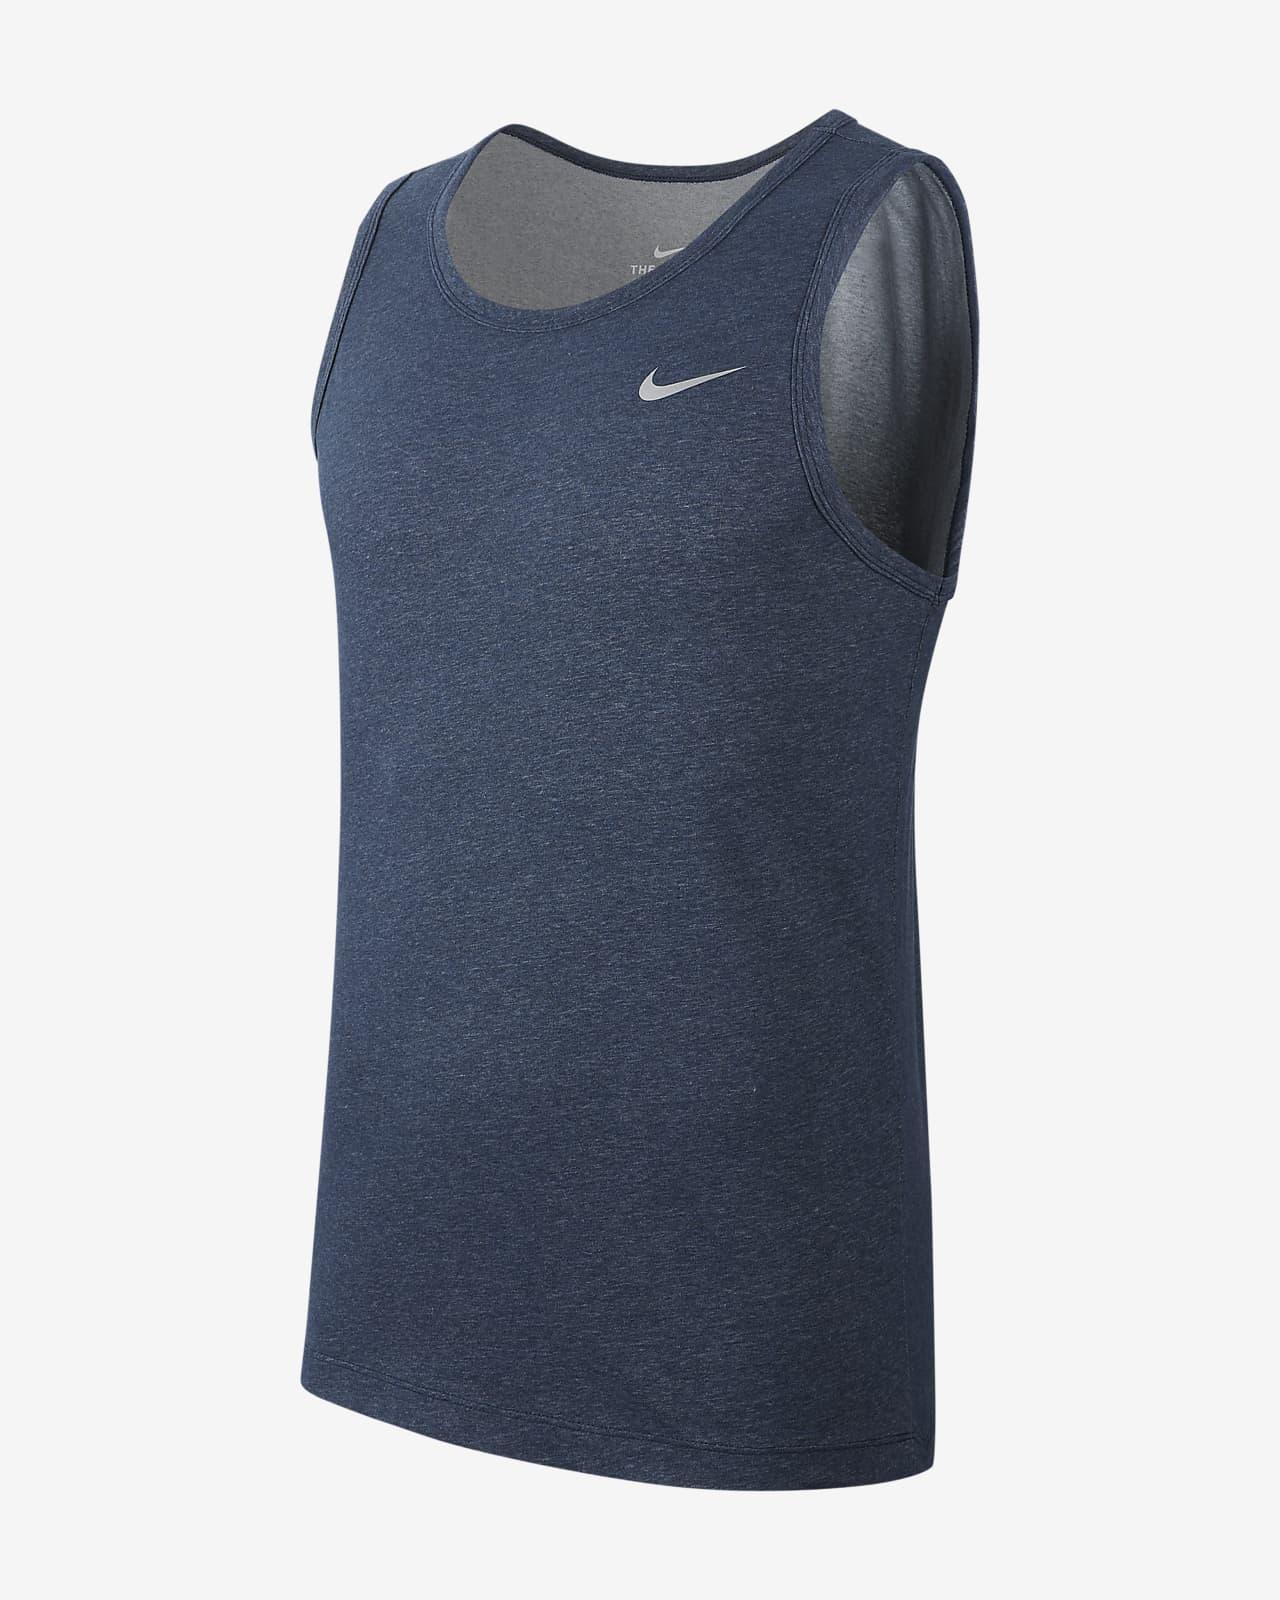 Canotta da training Nike Dri-FIT - Uomo